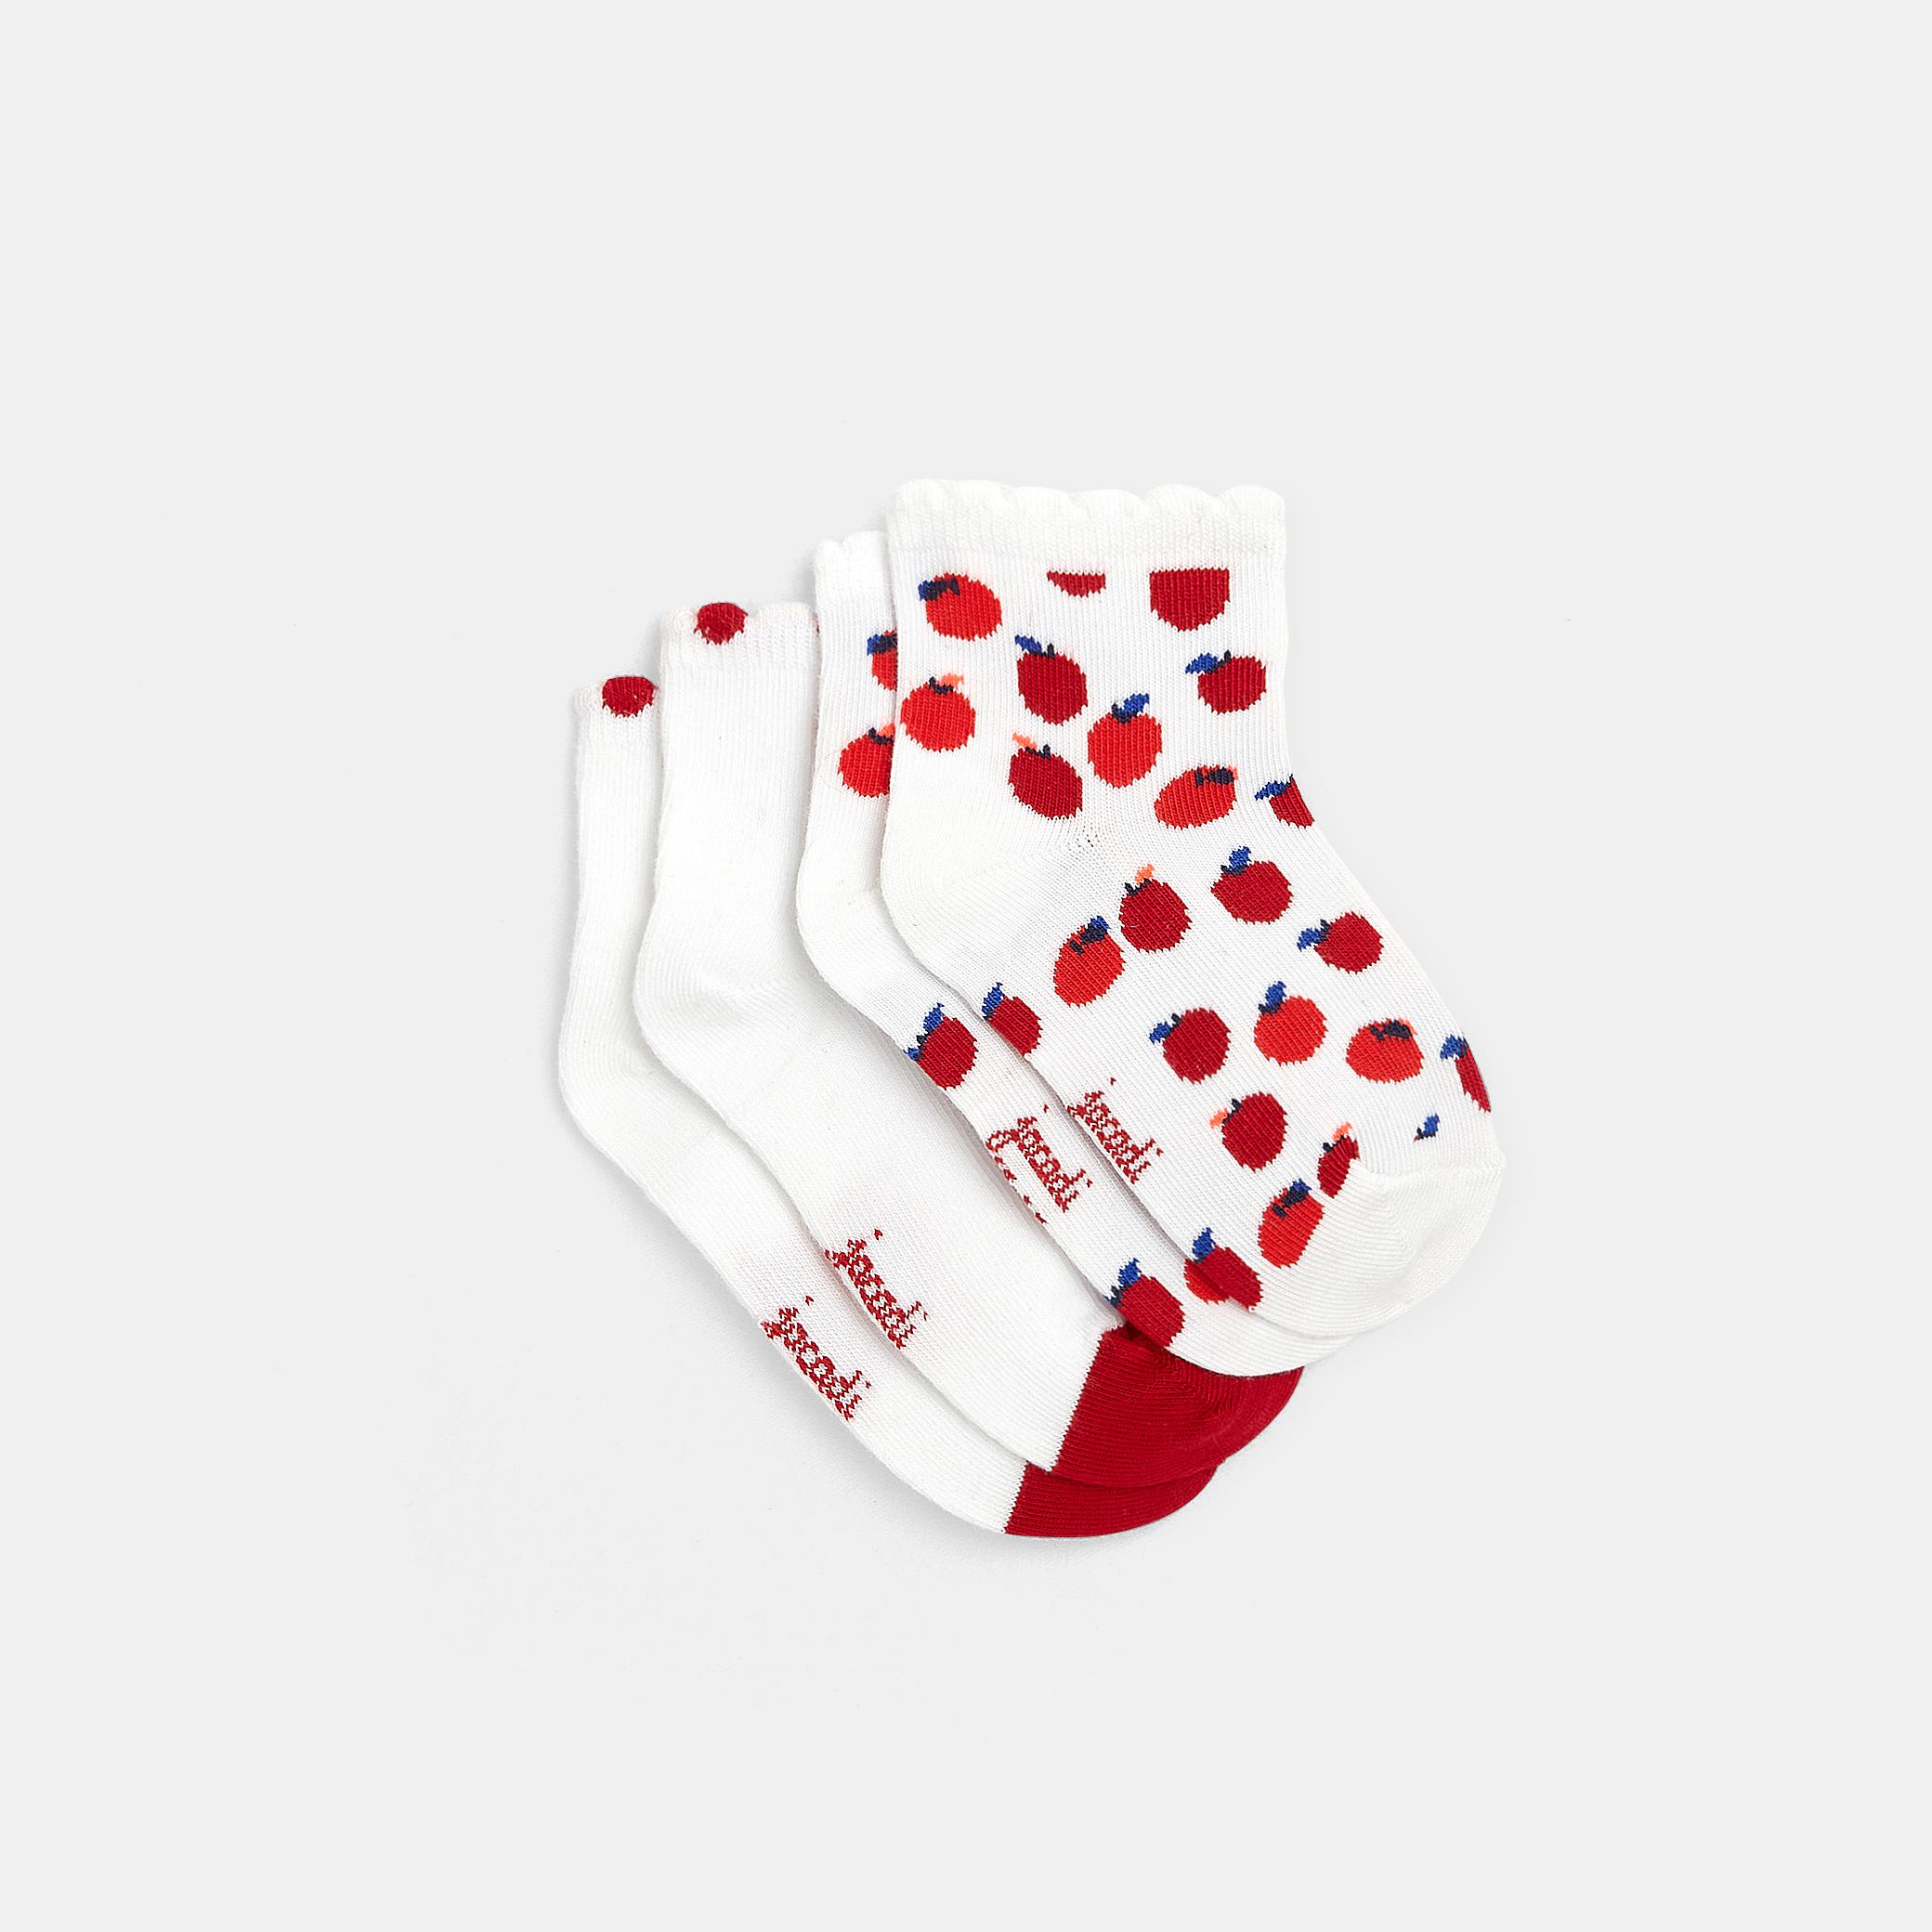 Pair of Maison Broussaud socks